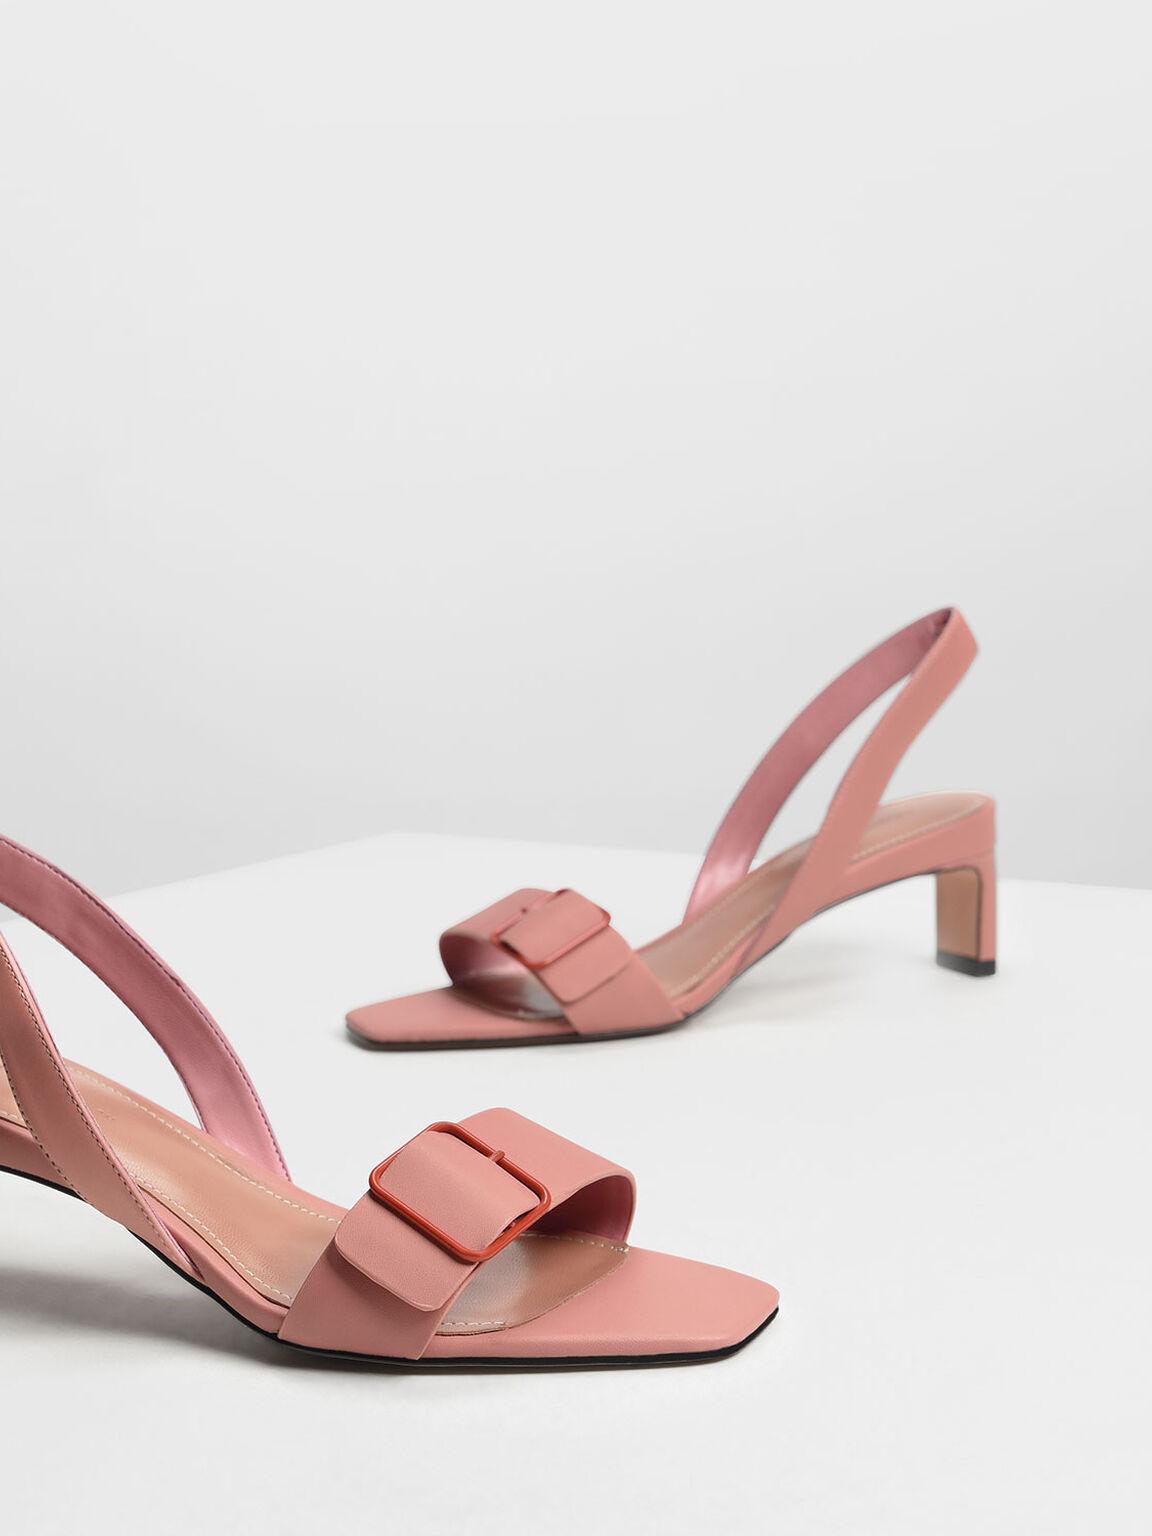 Wide Buckle Slingback Heels, Blush, hi-res